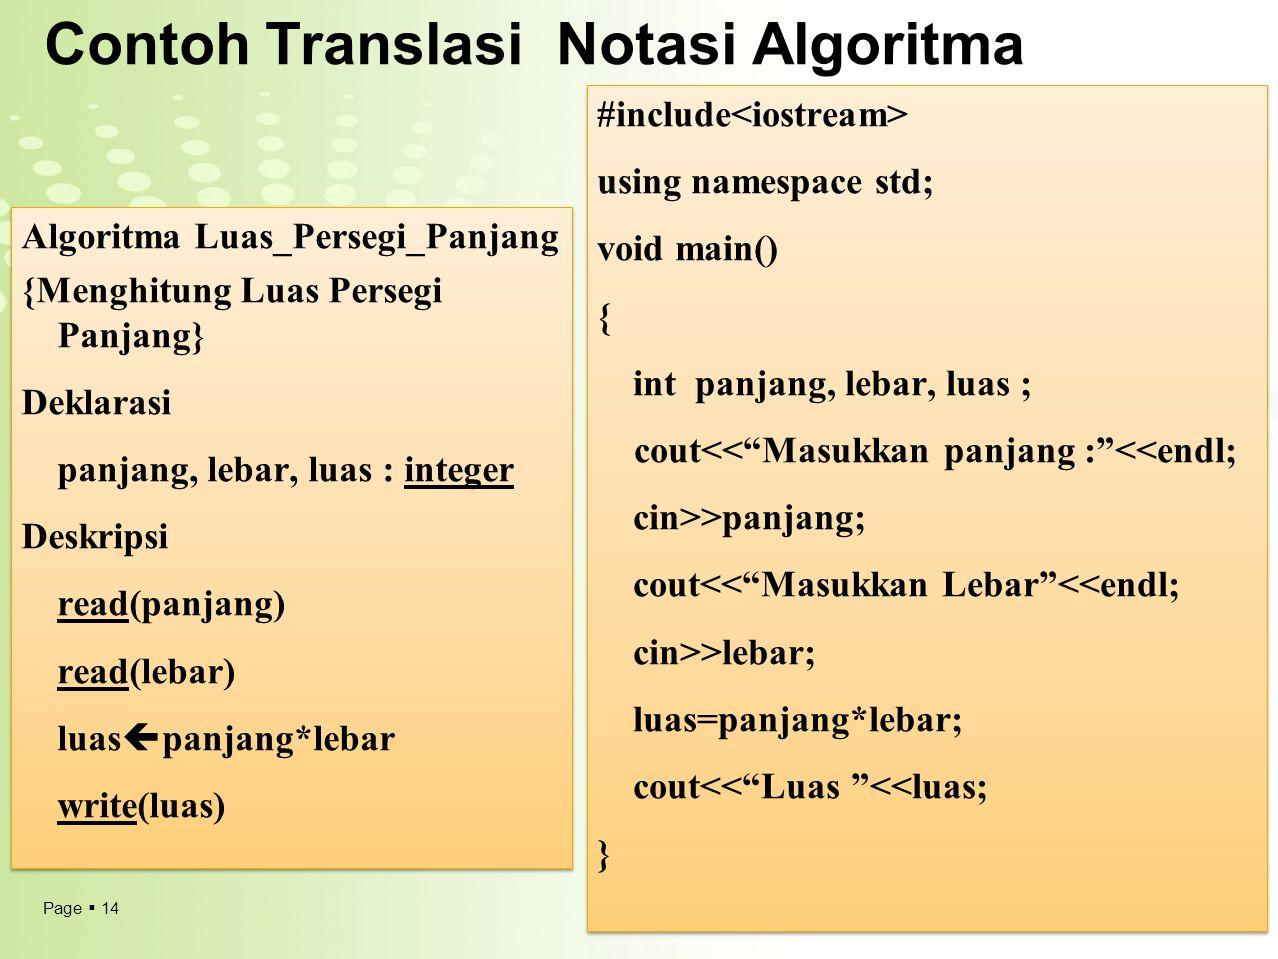 Contoh Translasi Notasi Algoritma